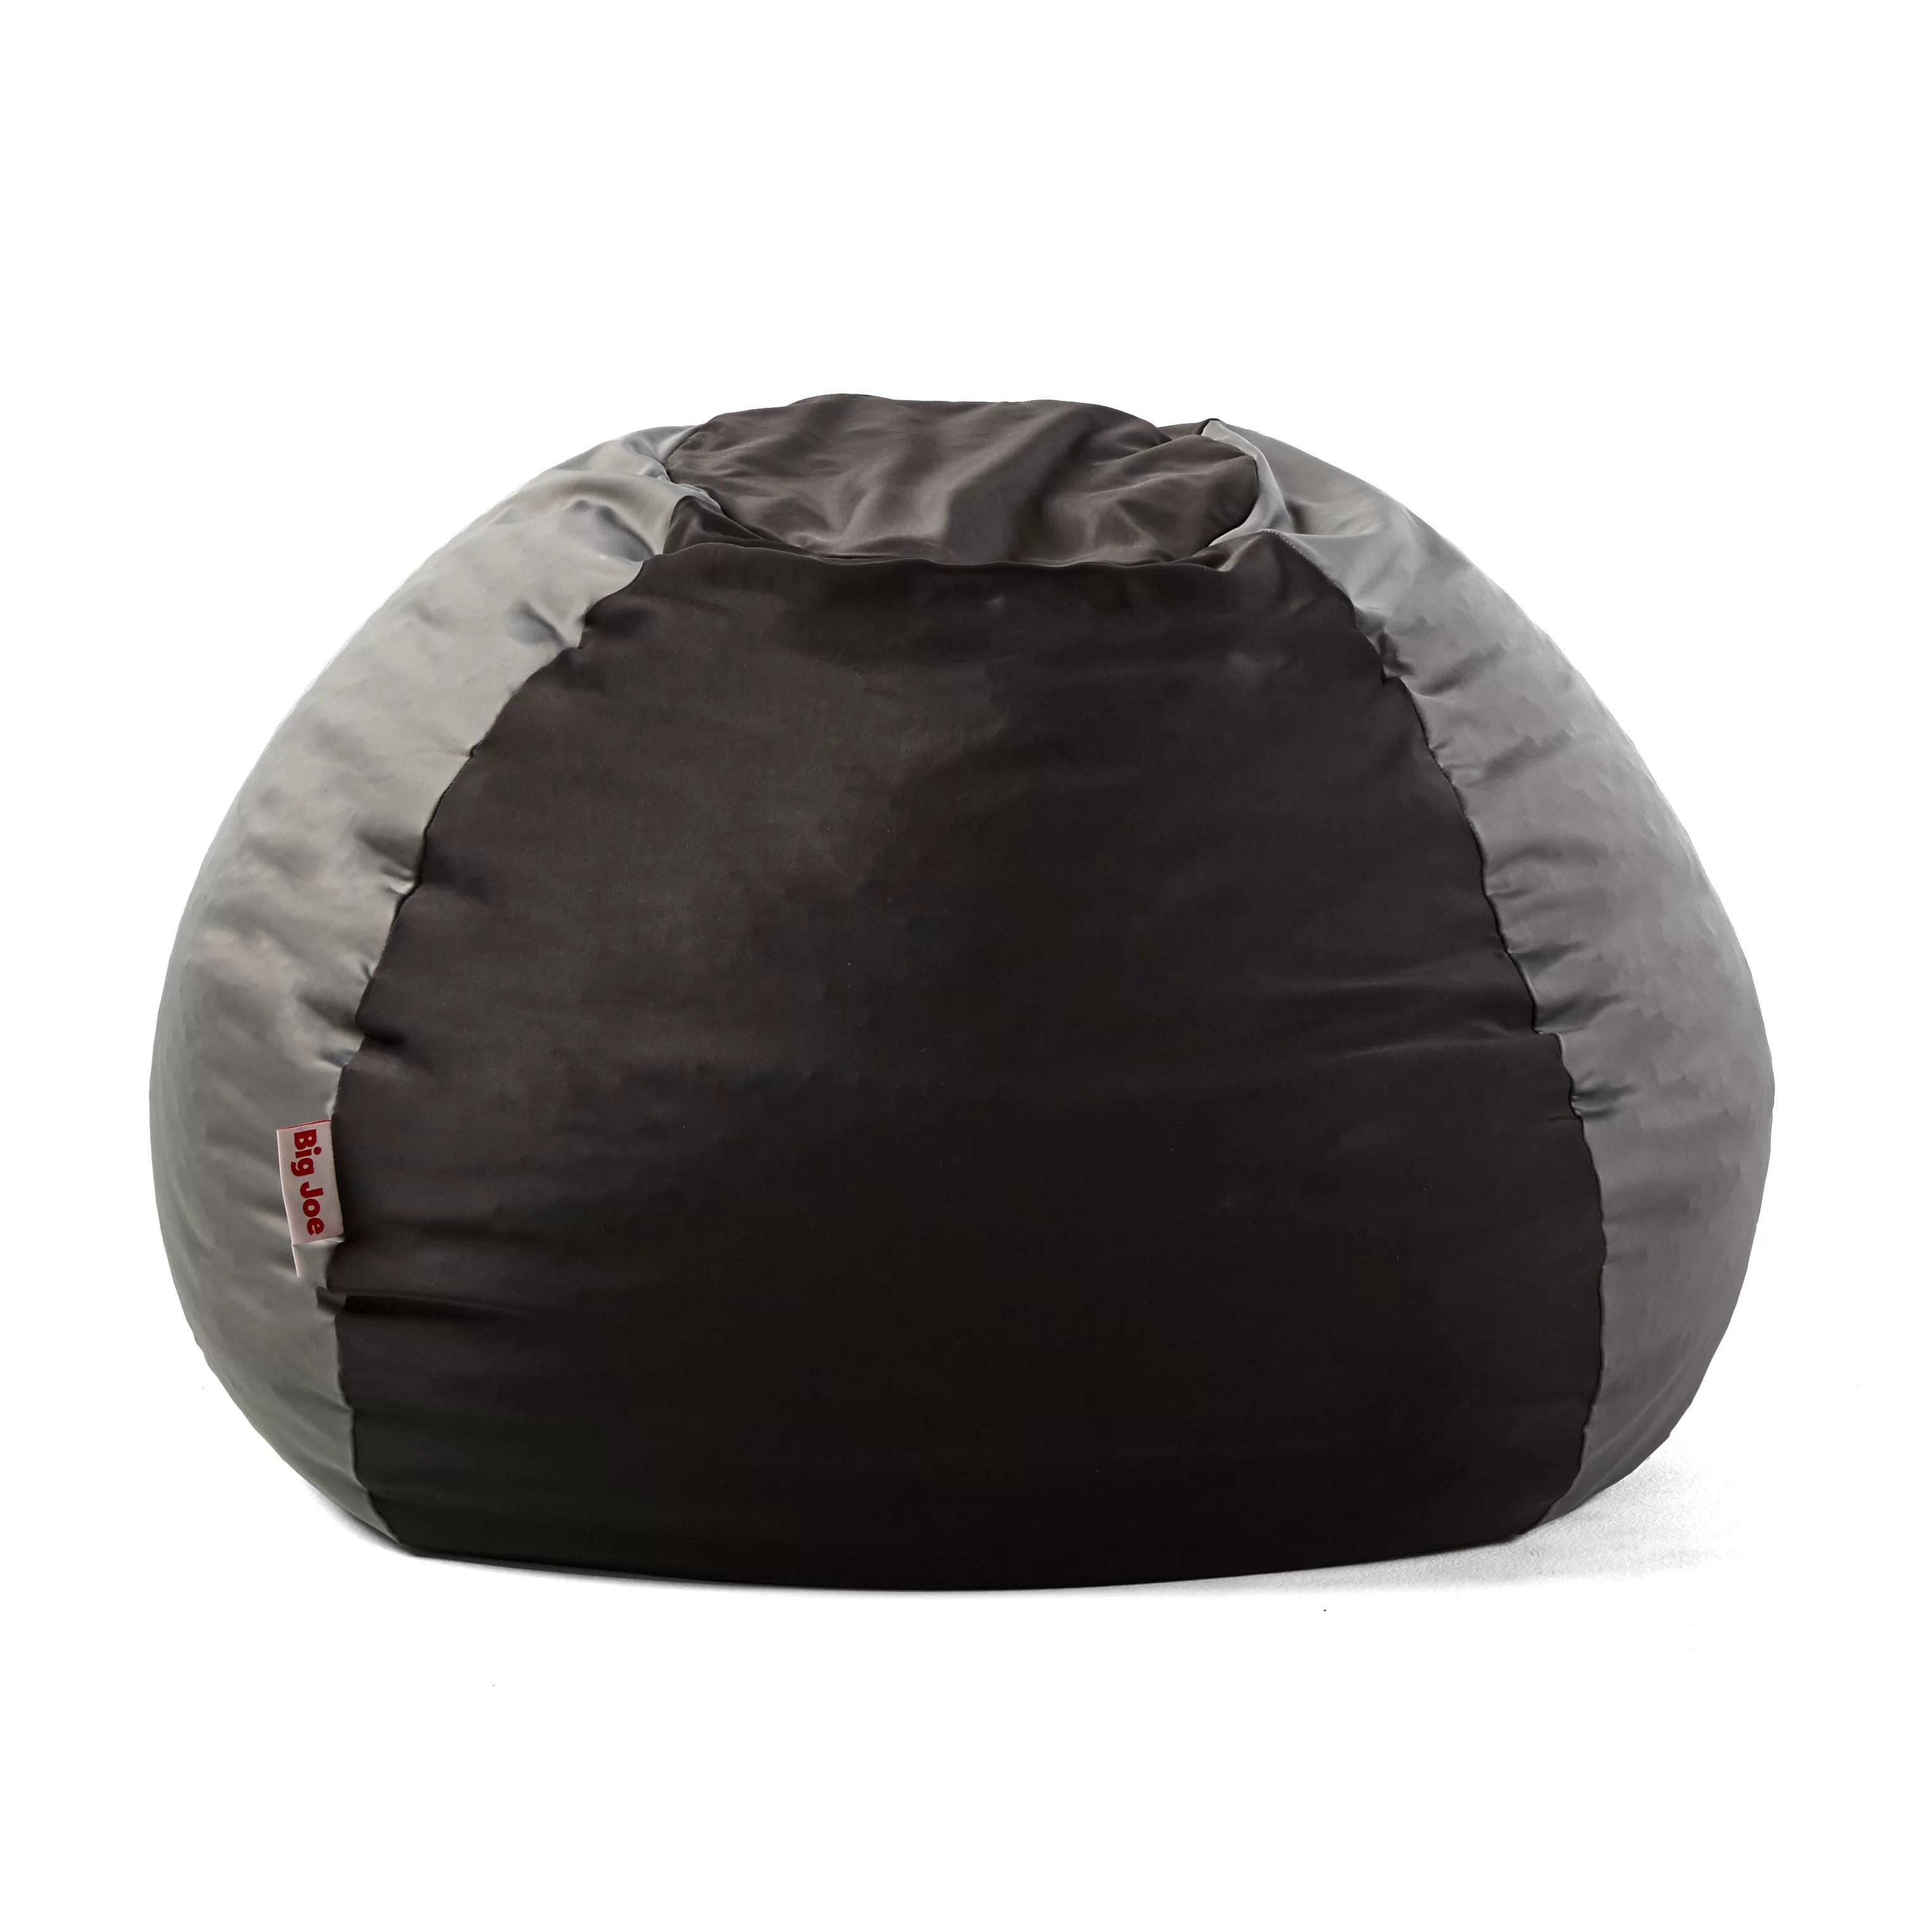 big cheap bean bag chairs organza chair sashes comfort research joe kushi wayfair